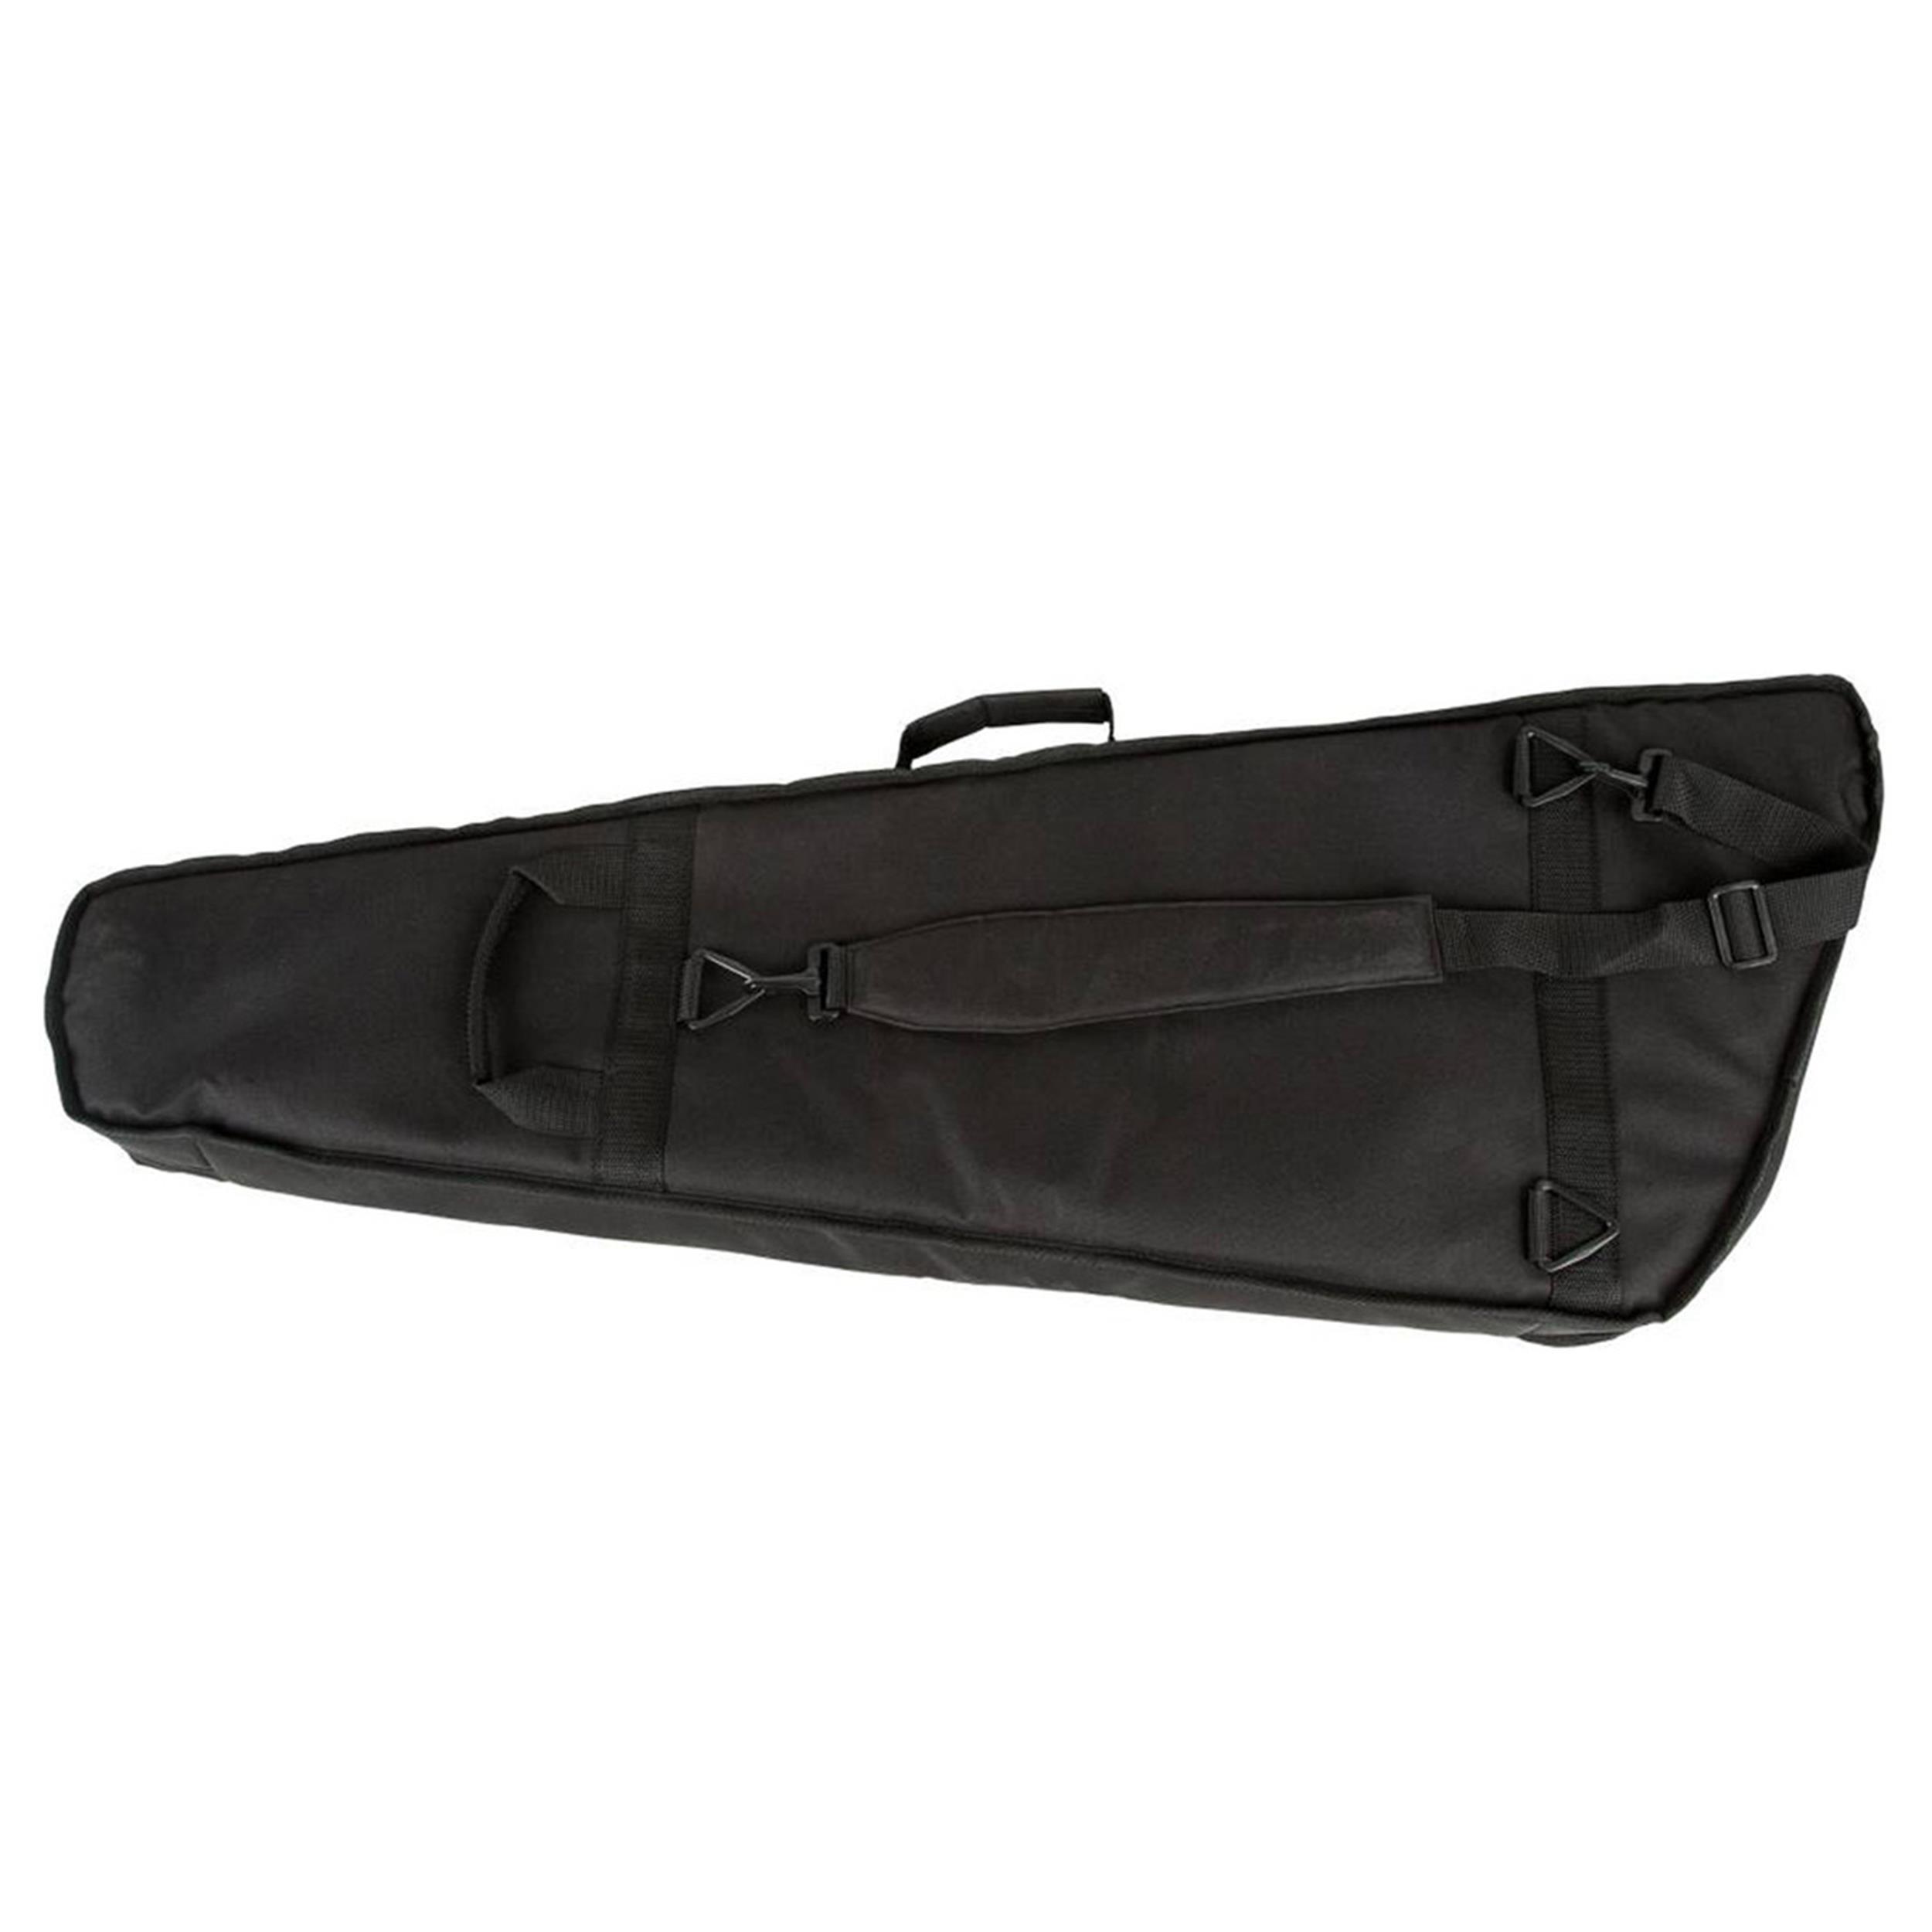 JACKSON GIG BAG BORSA MINION RR / KV  / WR / KY - 2991515106